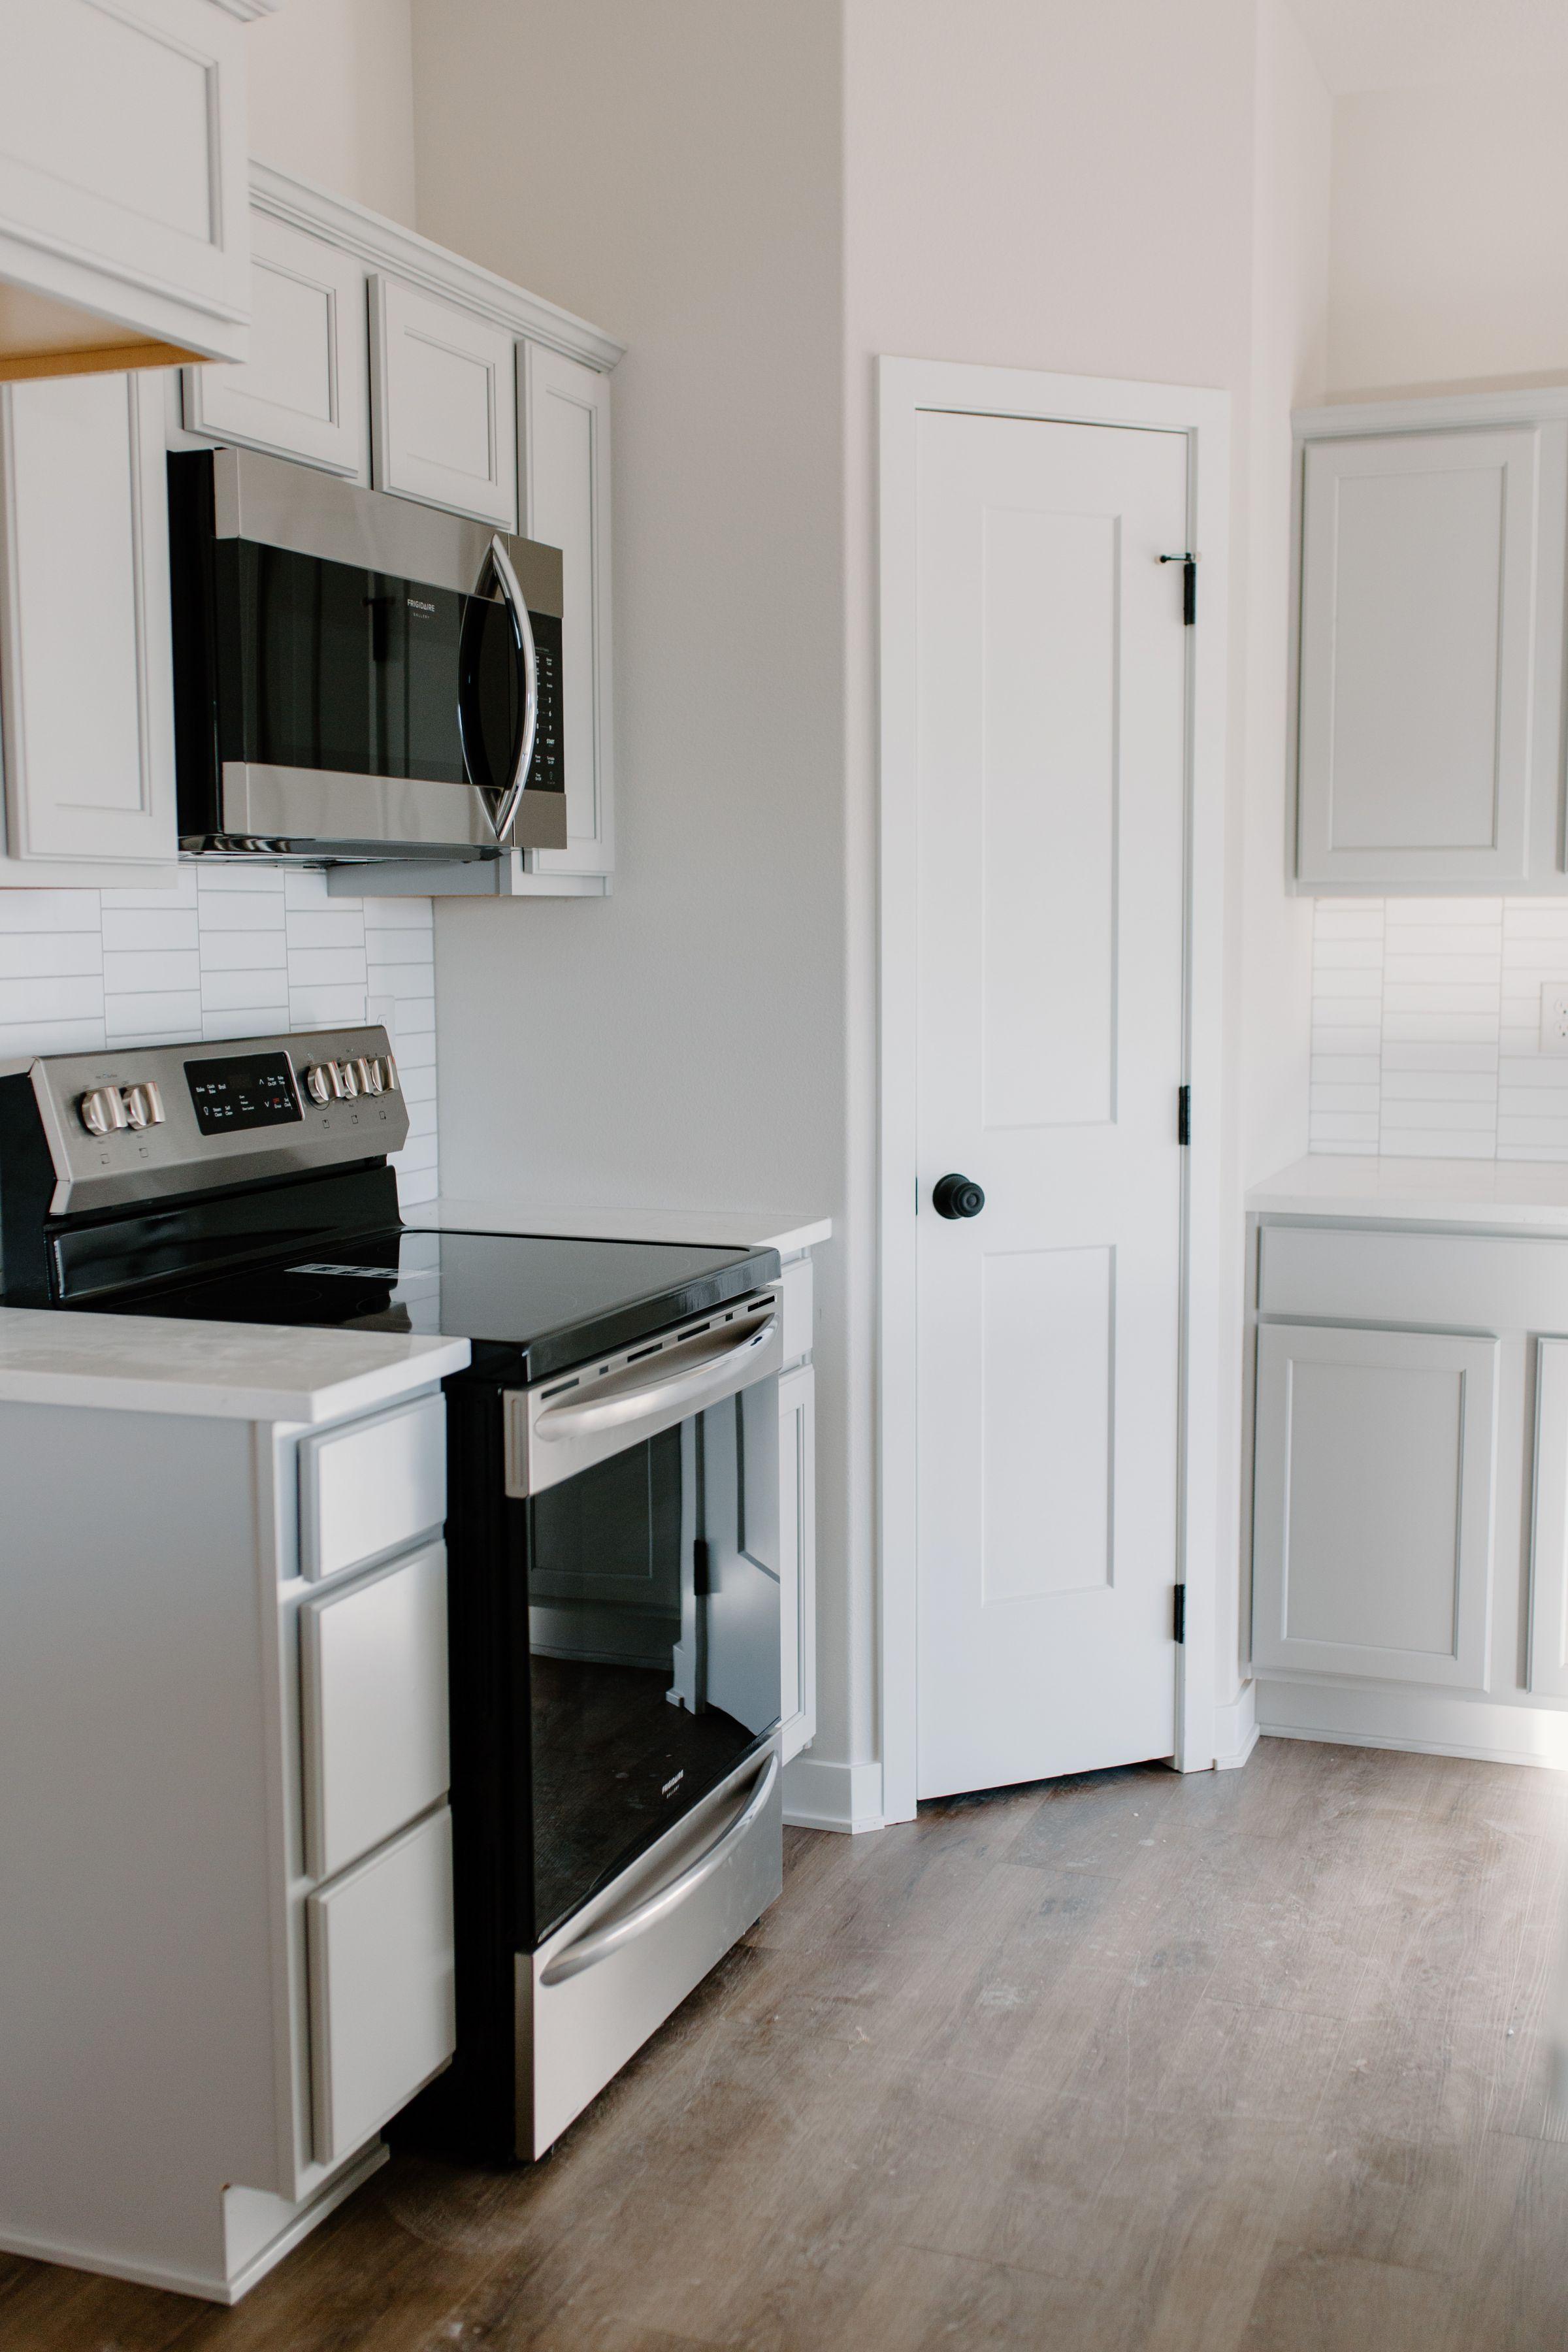 residential-warren-county-iowa-0-acres-listing-number-15366-3-2021-02-18-165313.jpg